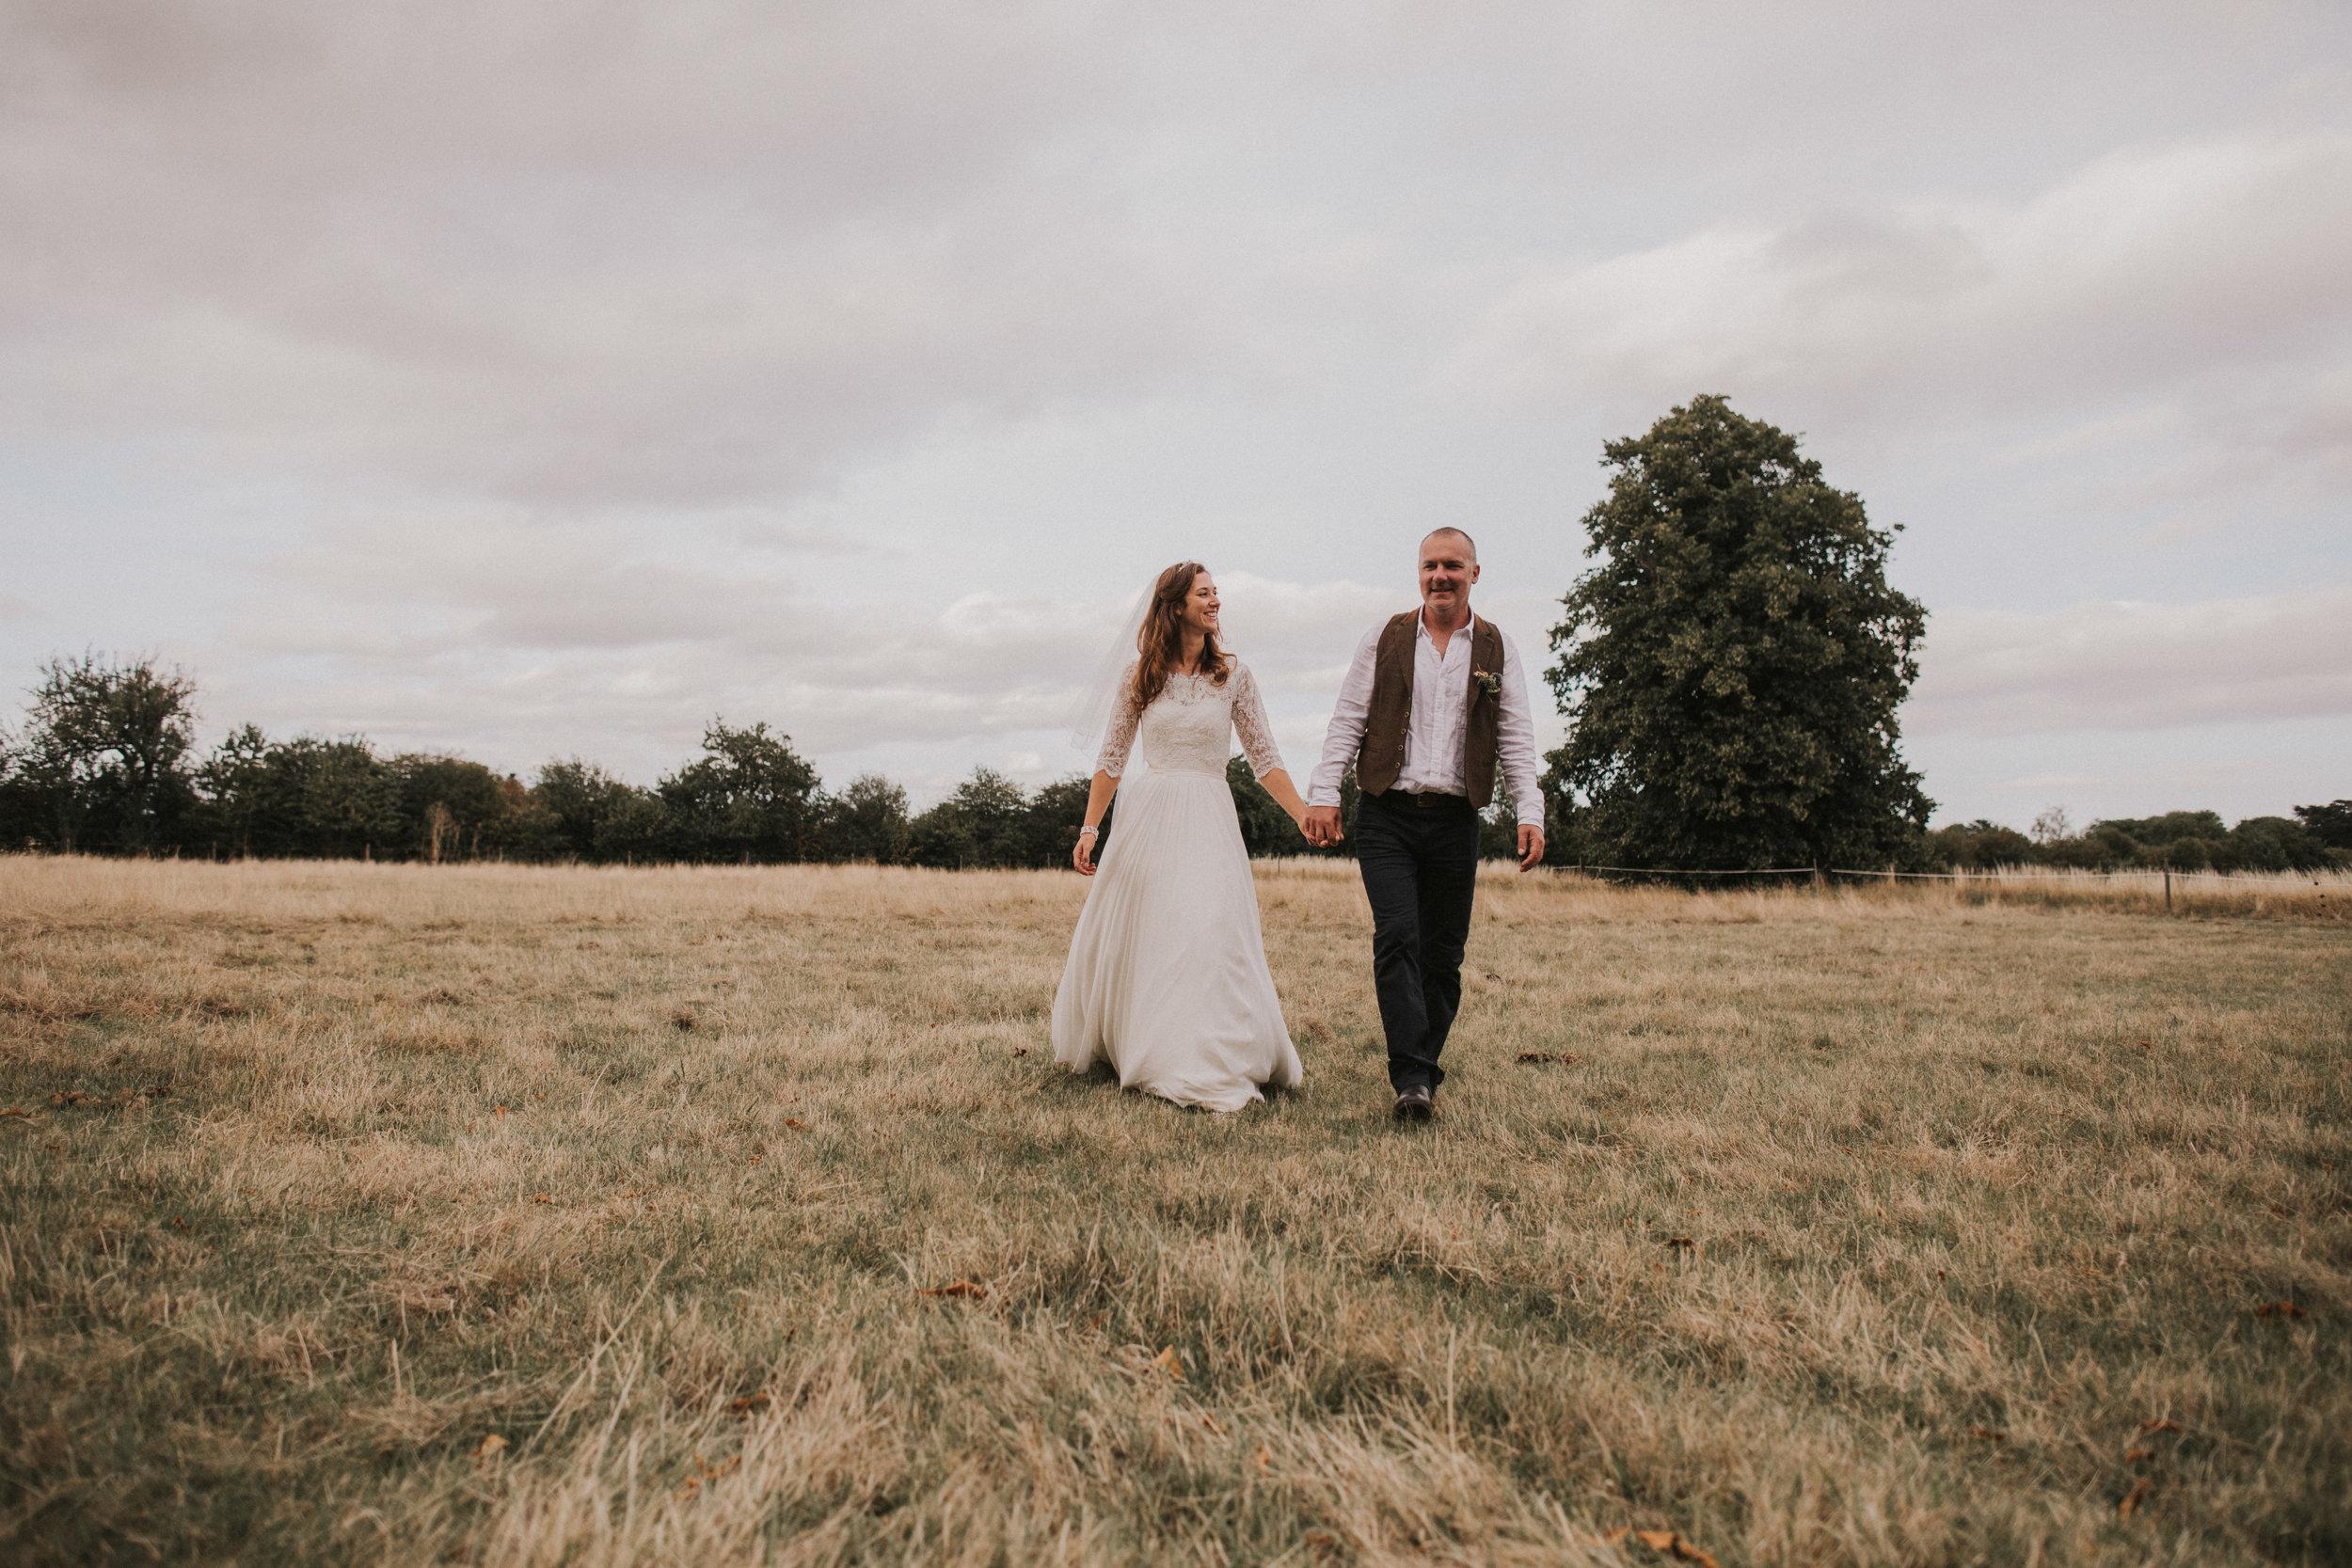 brook rose photography  Farm wedding_201.jpg